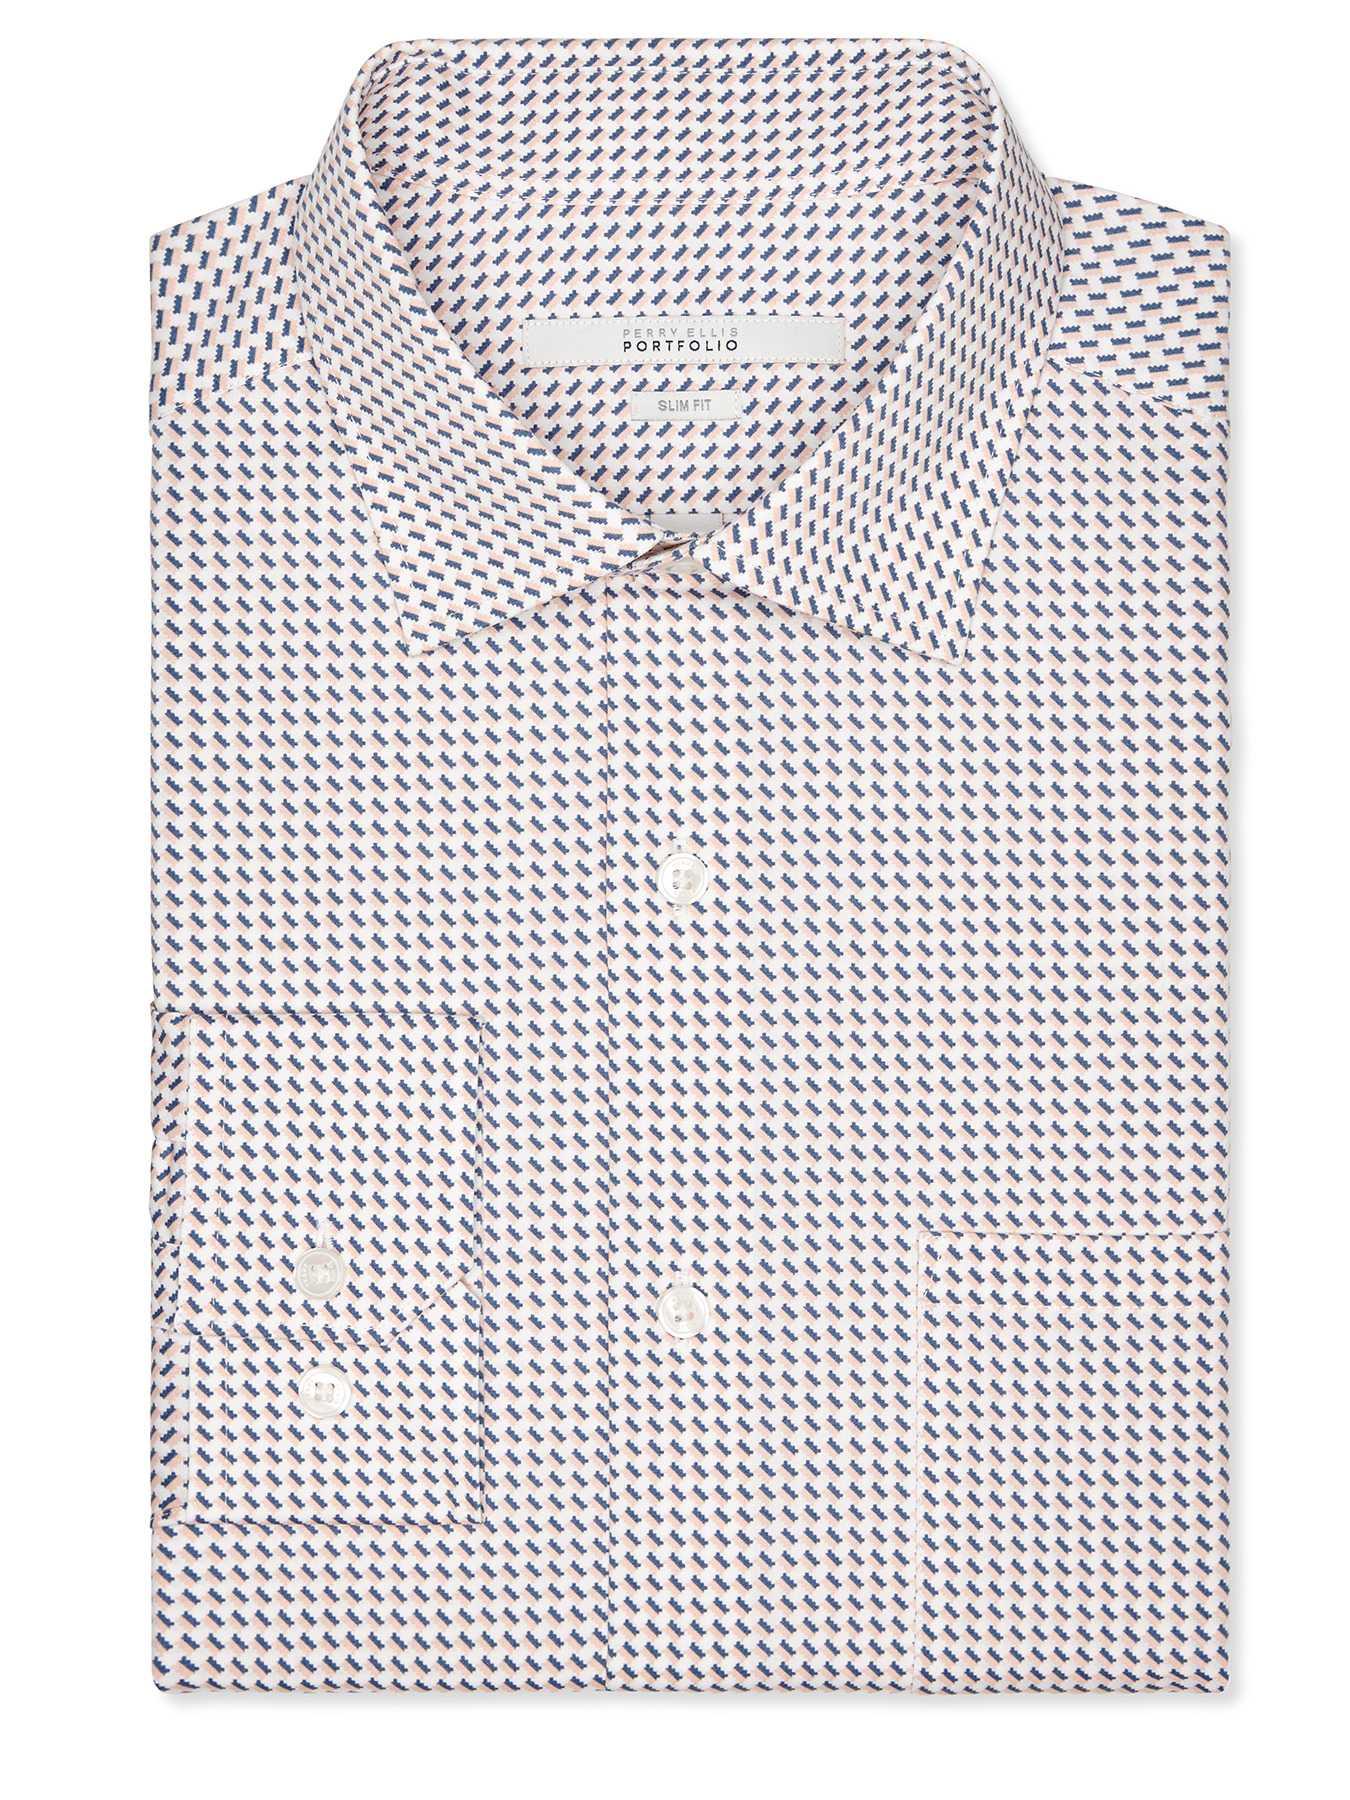 Perry Ellis Slim Fit Stamp Print Dress Shirt